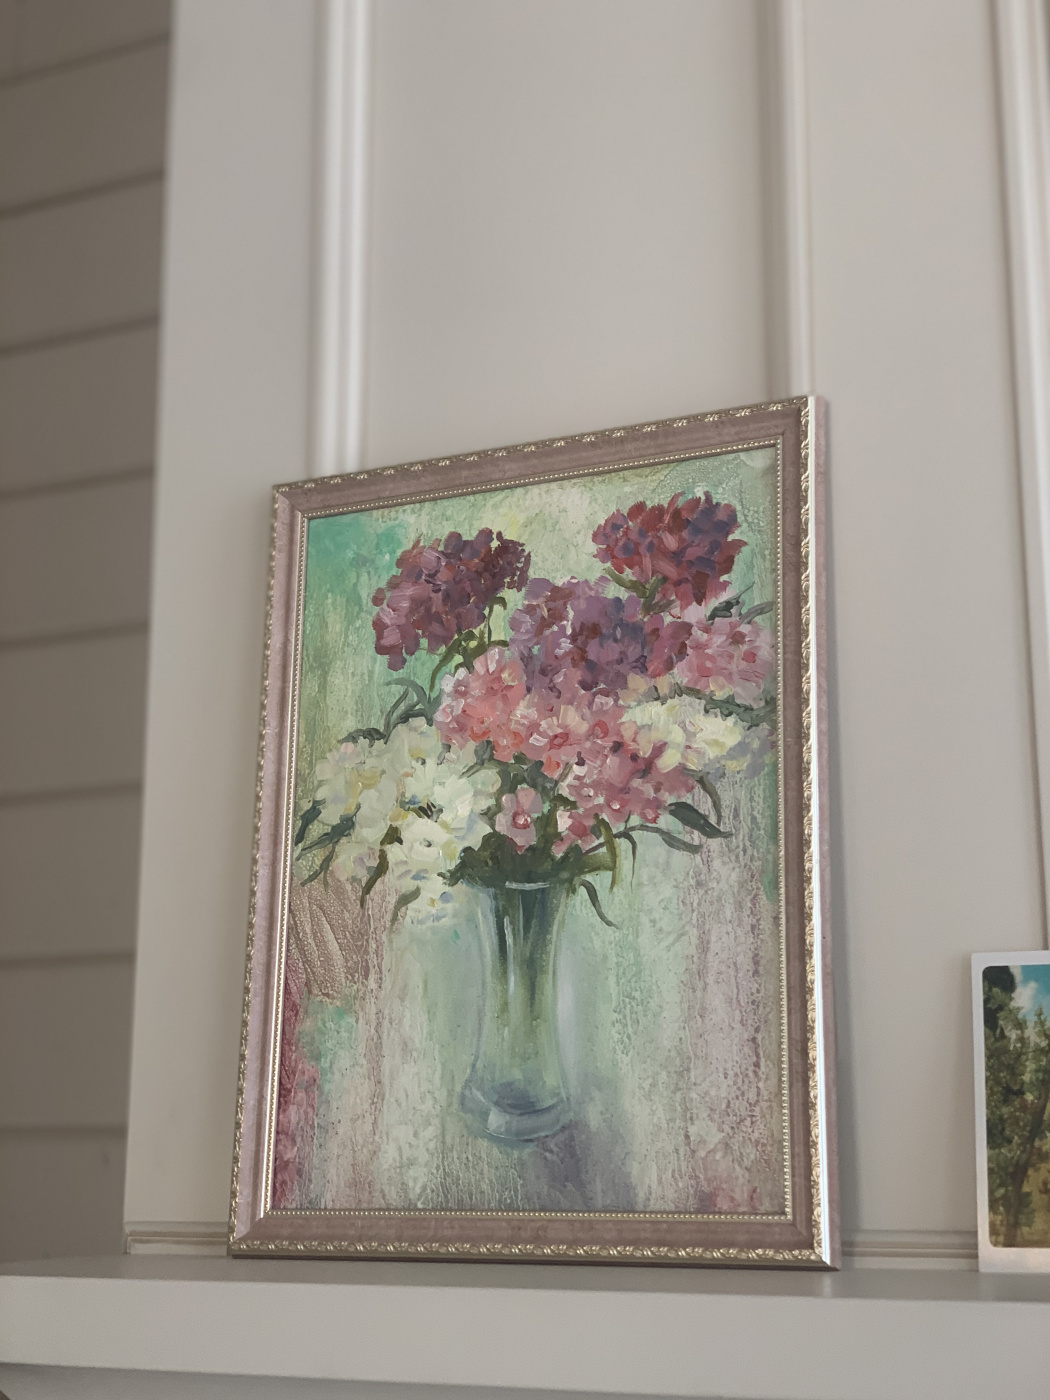 Alena Sleep. Flowers in a vase